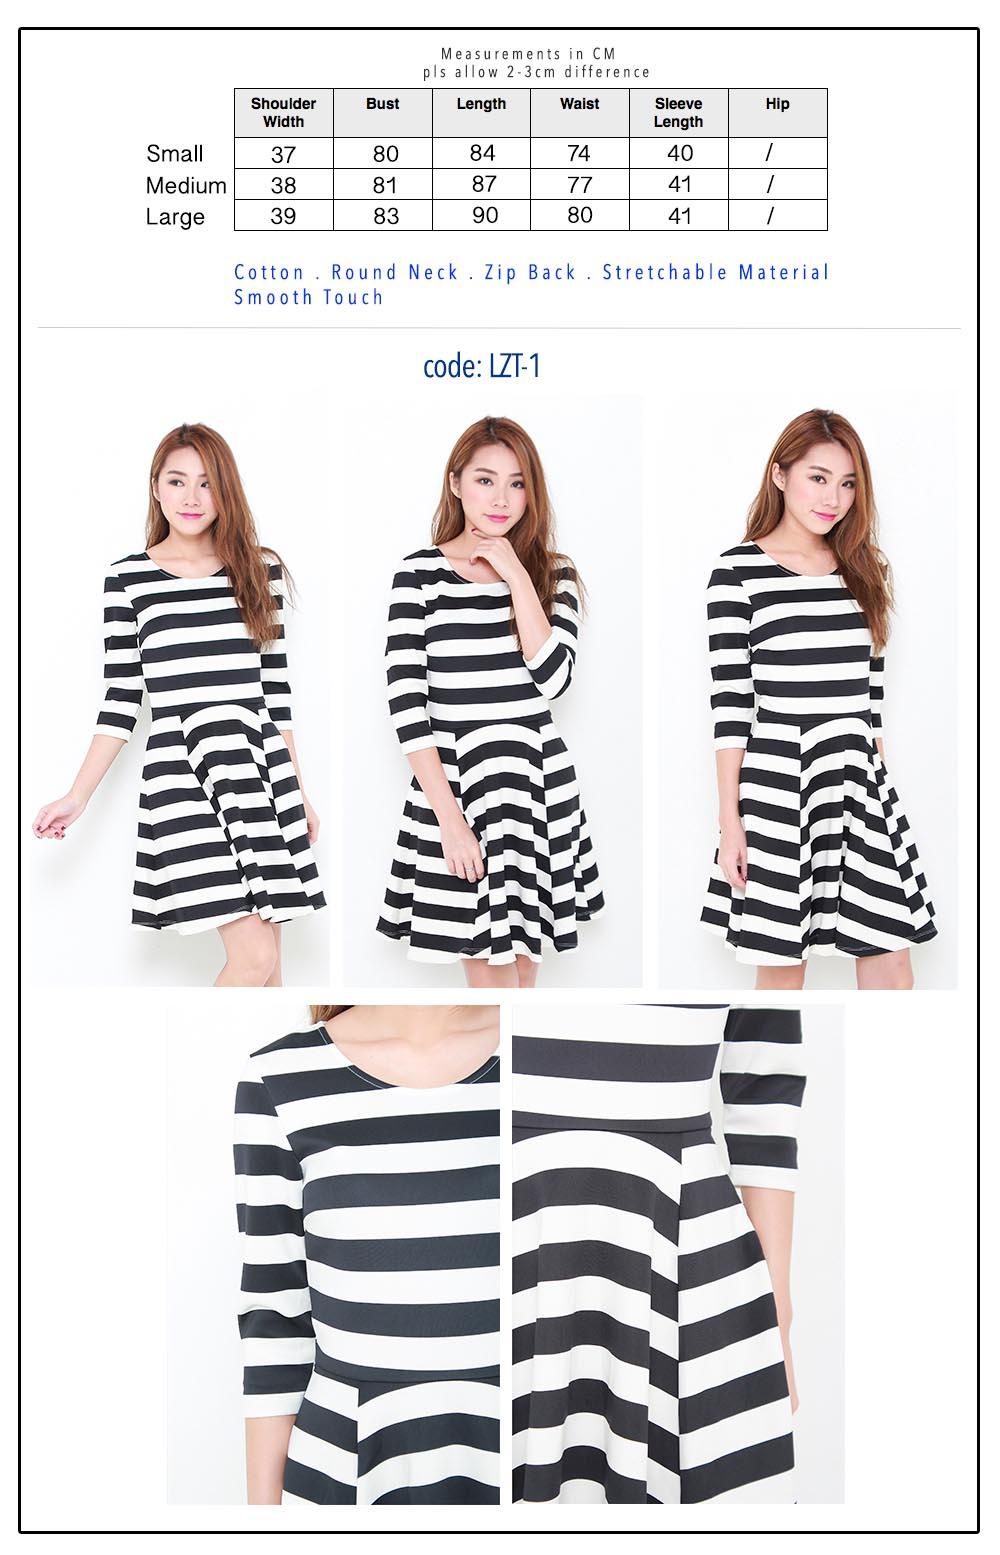 ... Floral Prints Shift Dress/Boxy Top - Tops Bottoms Blouse Skirt Shirt